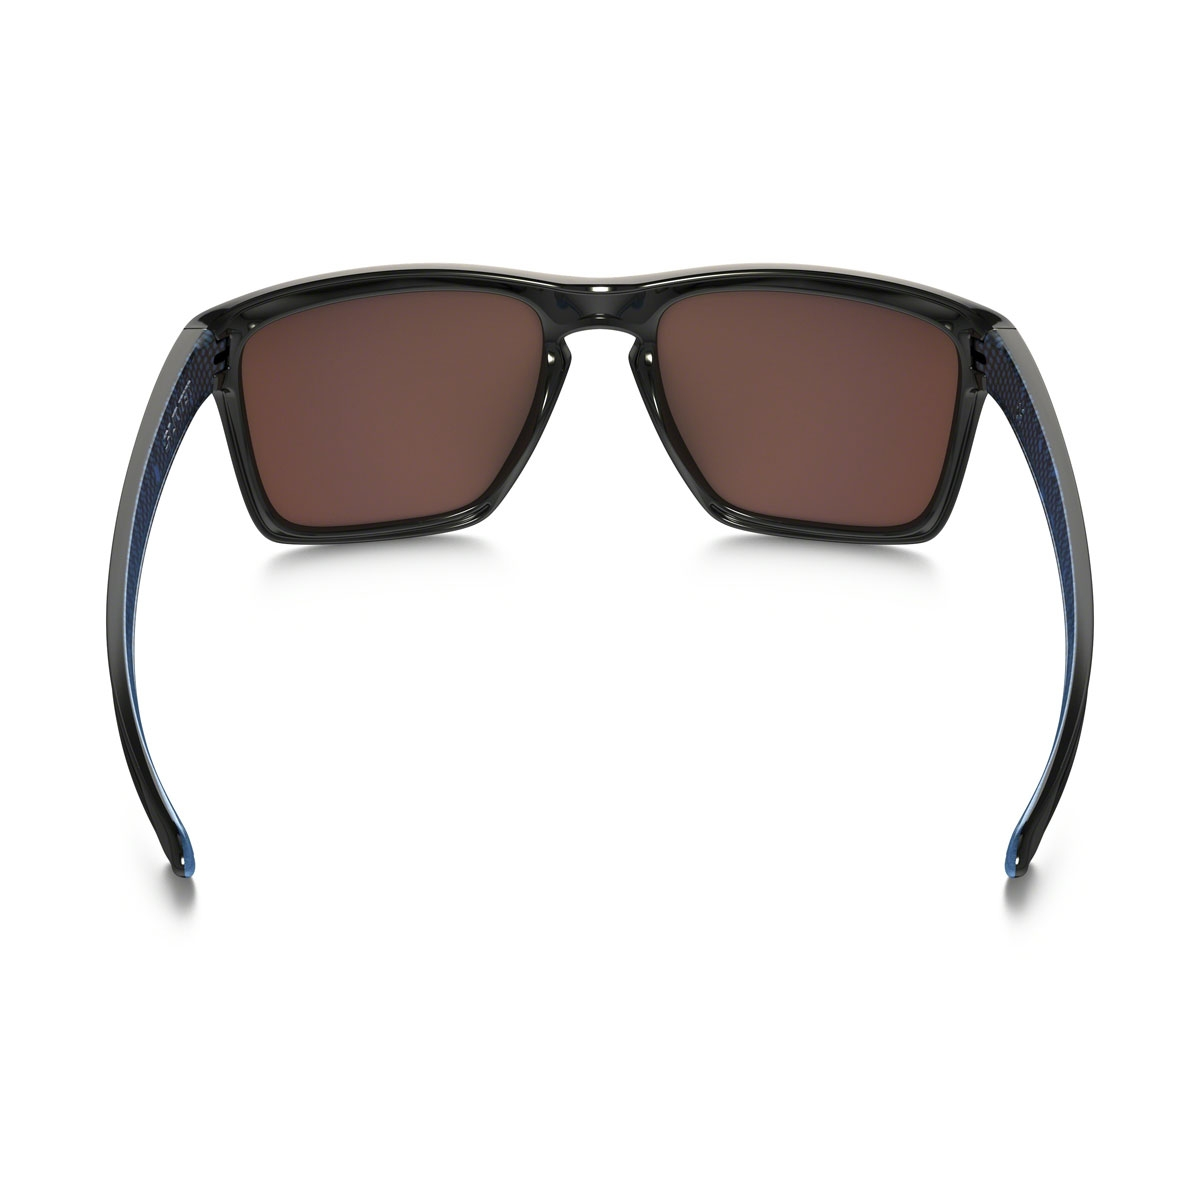 4fd53e6b6c9 ... Image of Oakley Sliver XL Prizm Deep Water Sunglasses - Polished Black    Prizm Deep Water ...